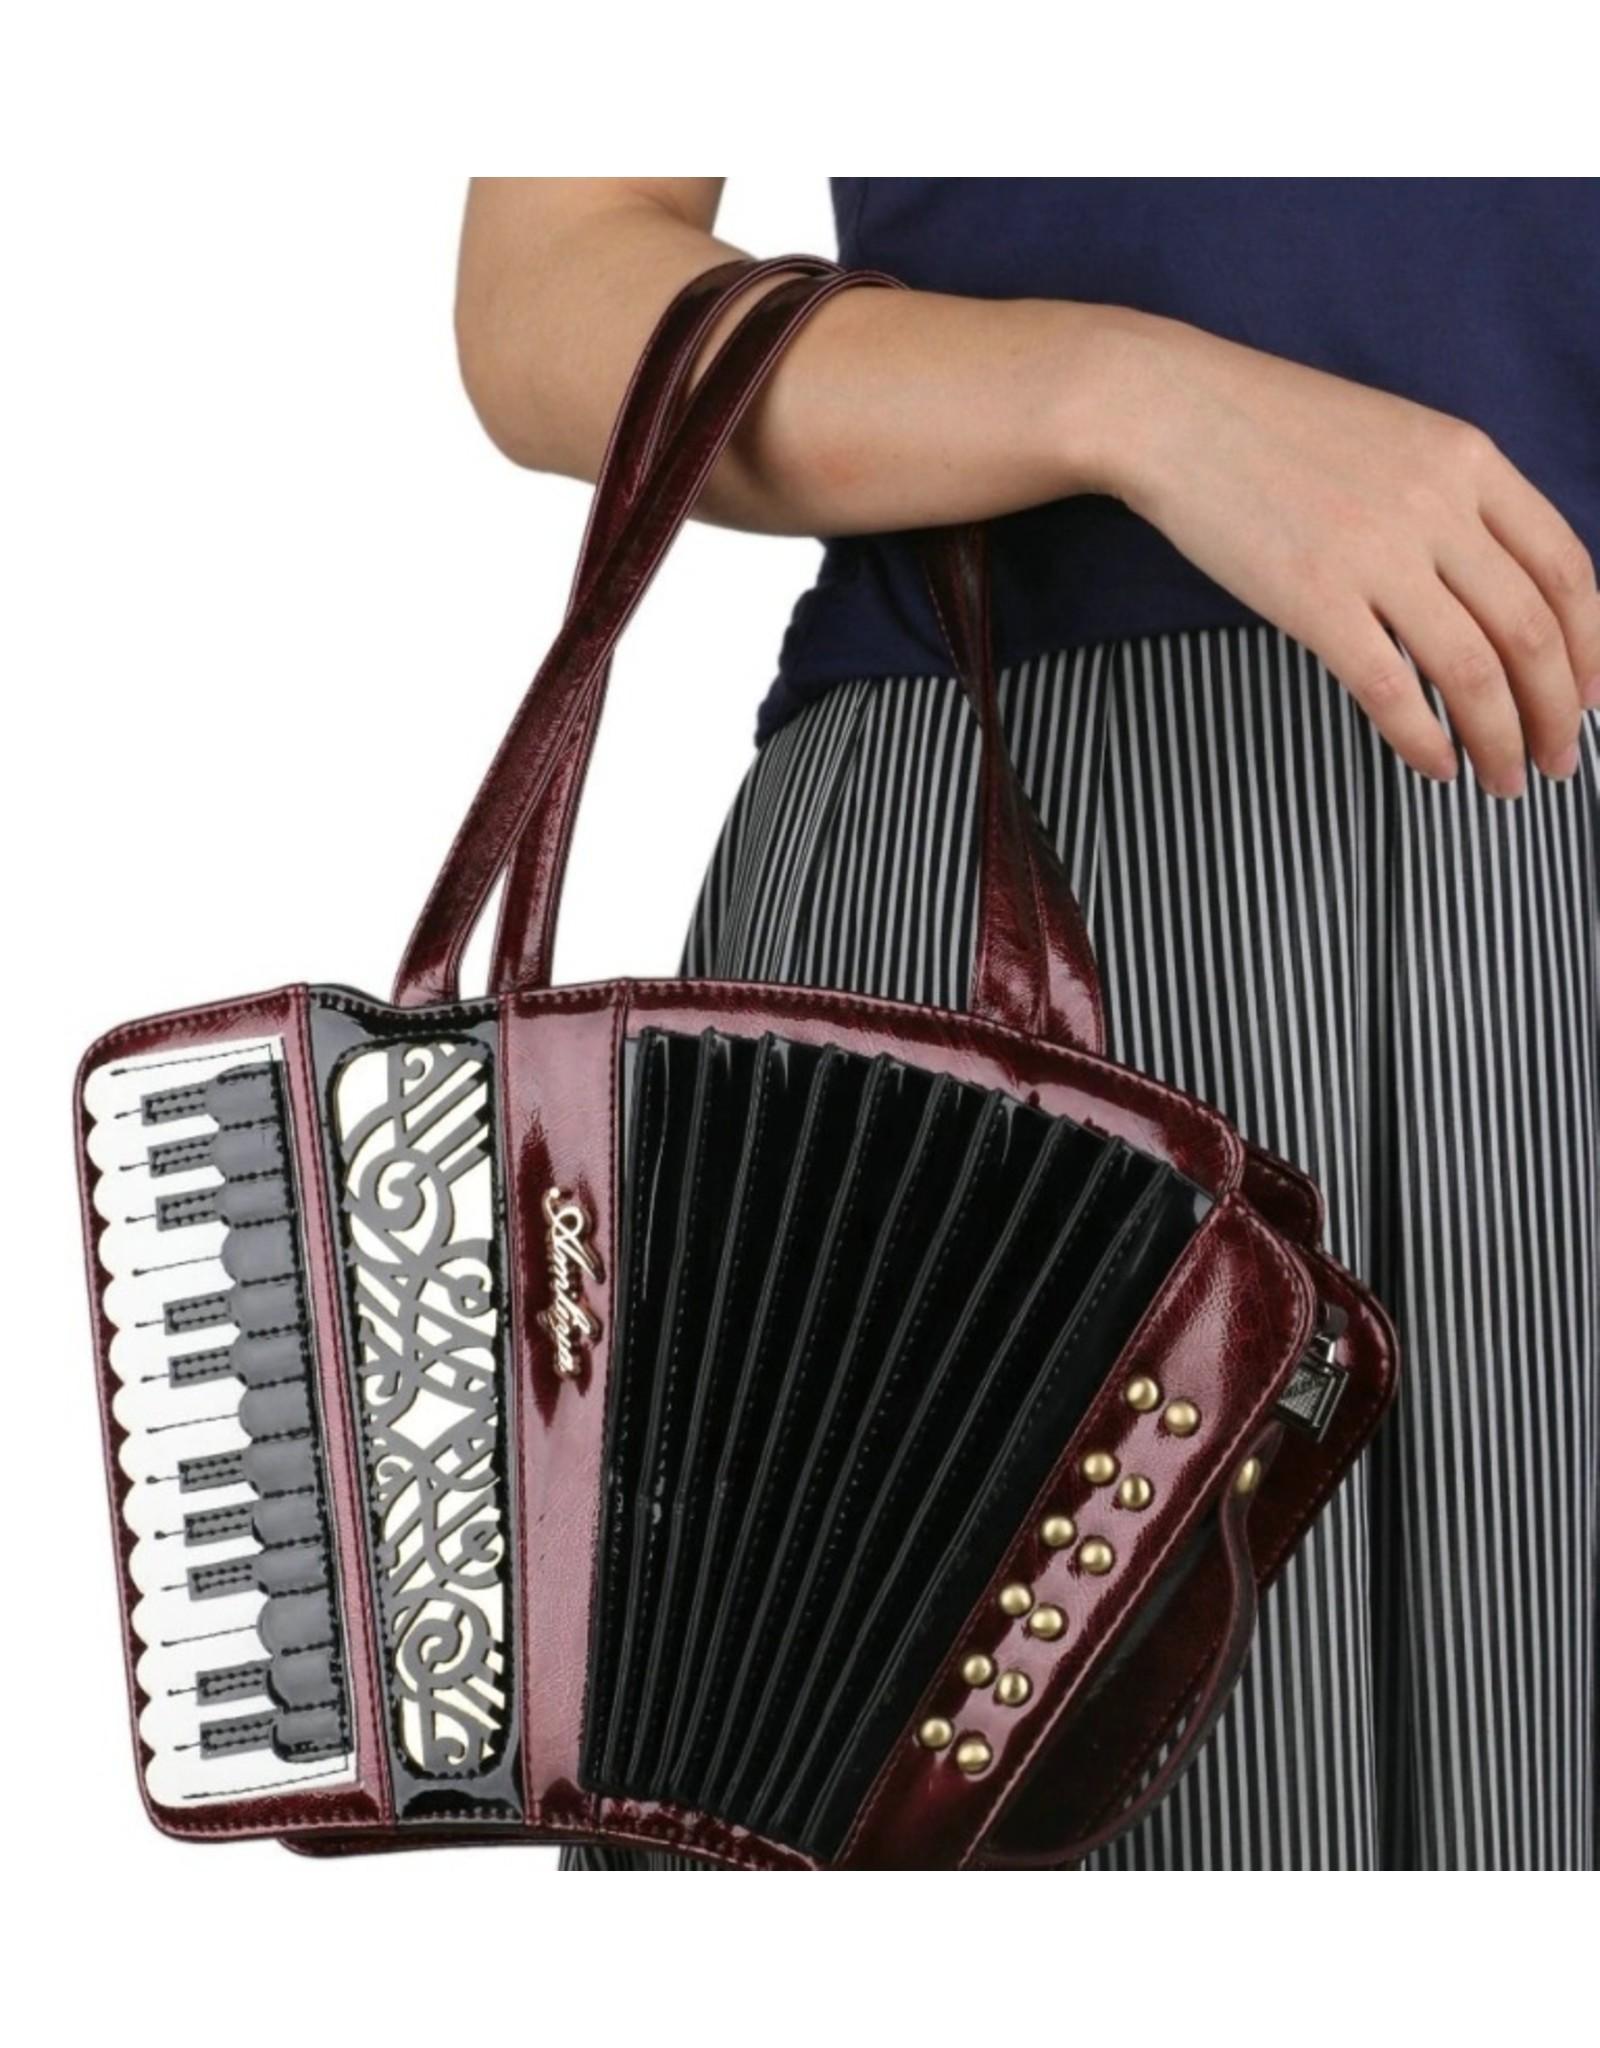 Magic Bags Fantasy bags and wallets - Fantasy handbag Accordion (metallic red)